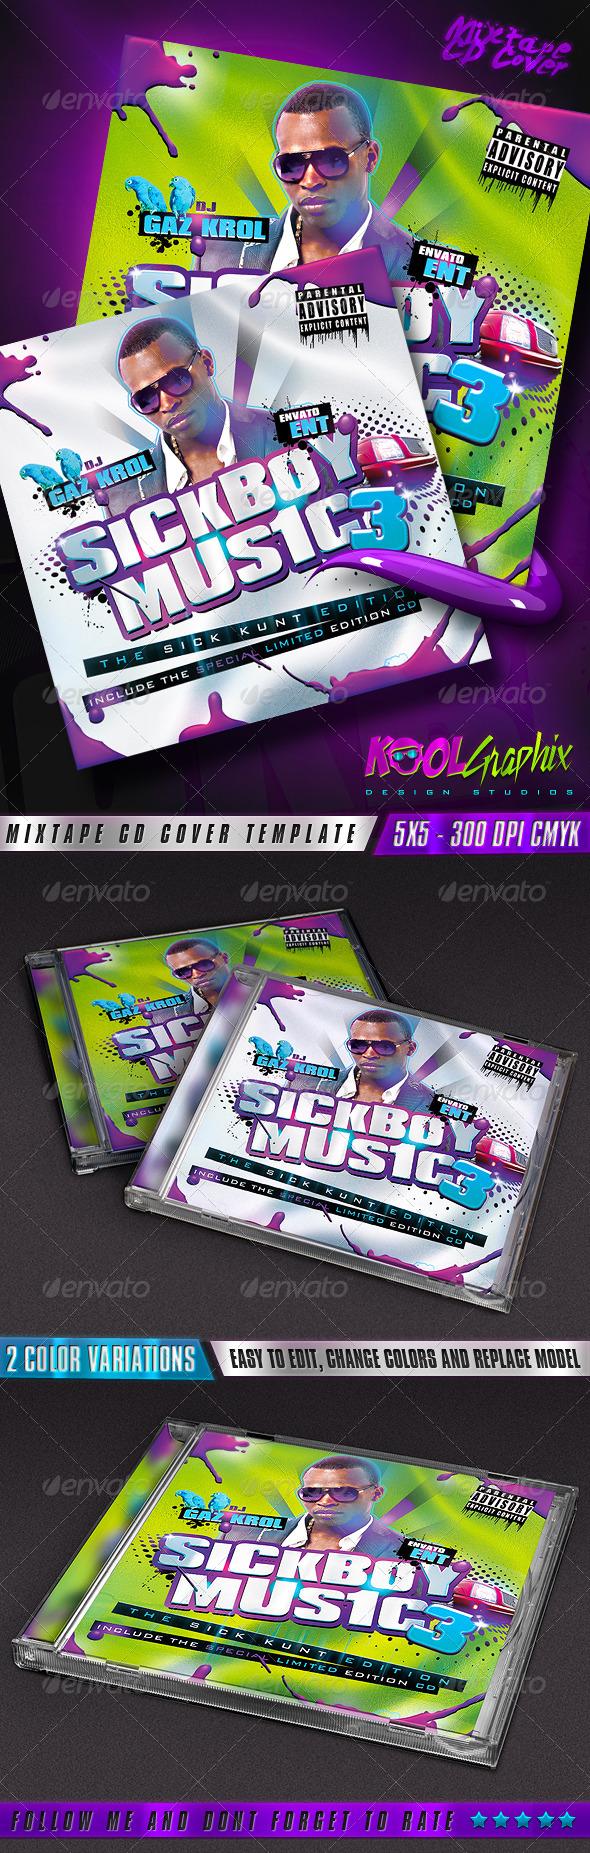 SickBoy Music - Mixtape CD Cover  - CD & DVD Artwork Print Templates